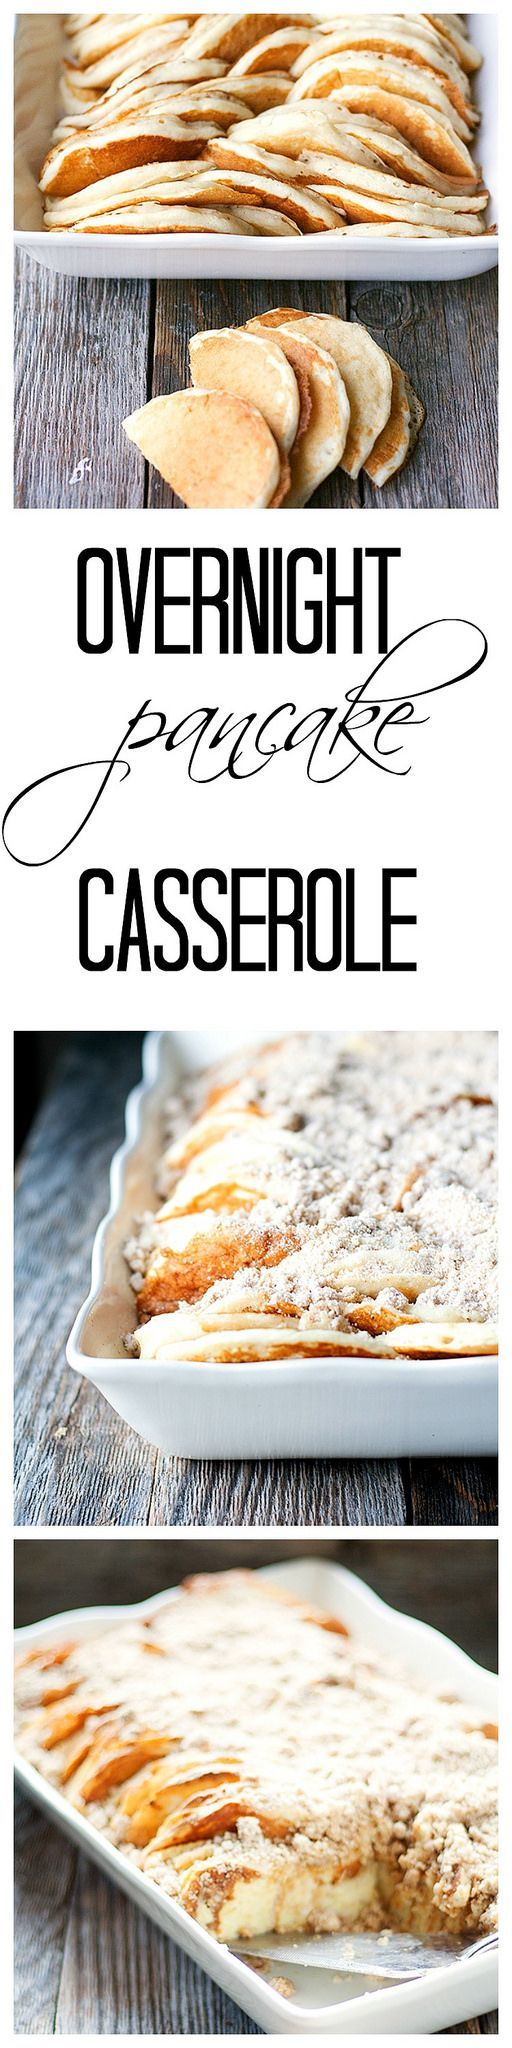 Overnight Pancake Casserole #brunch #holidays